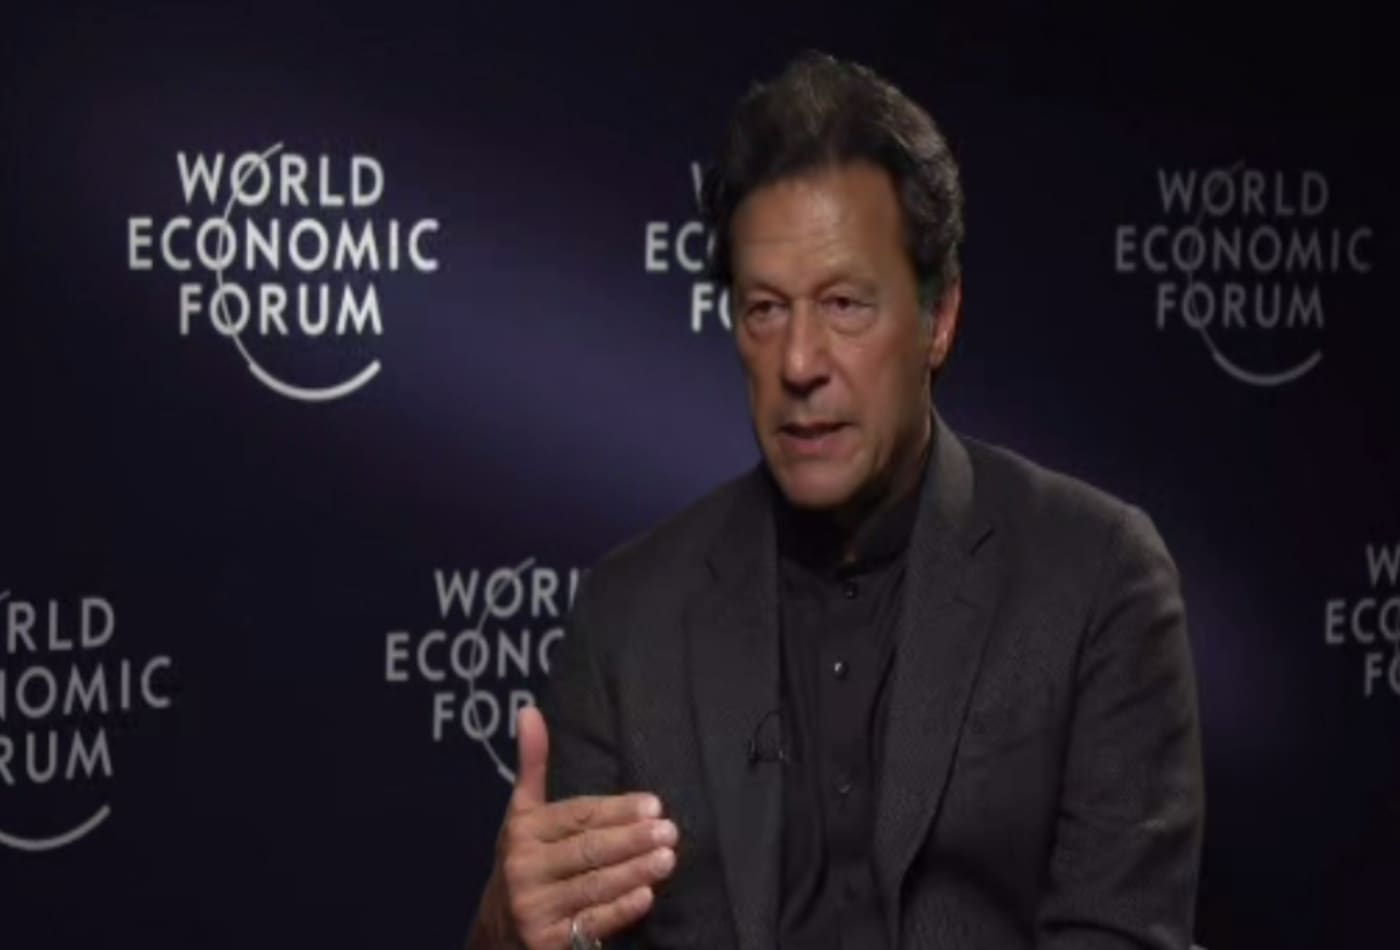 Pakistan Prime Minister Imran Khan: Kashmir is a far more serious problem than people realize